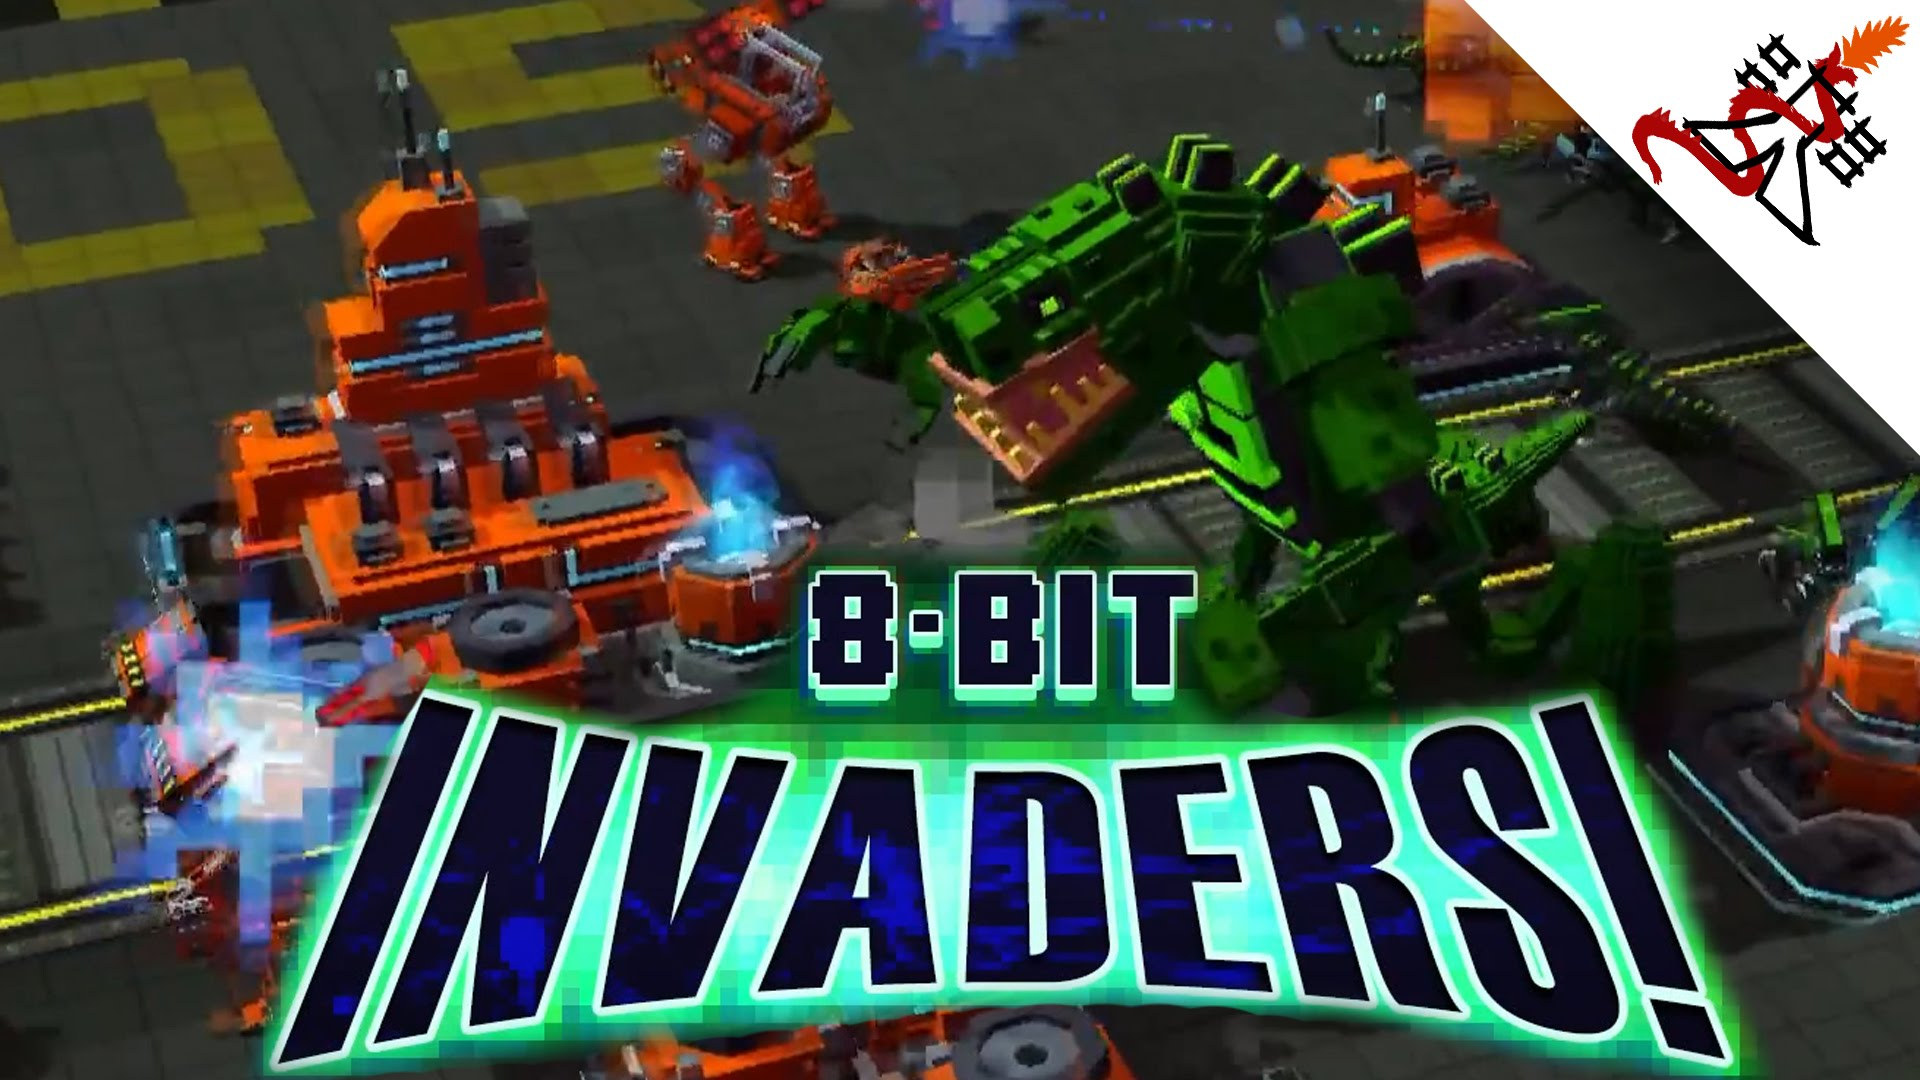 High Resolution Wallpaper   8-Bit Invaders! 1920x1080 px